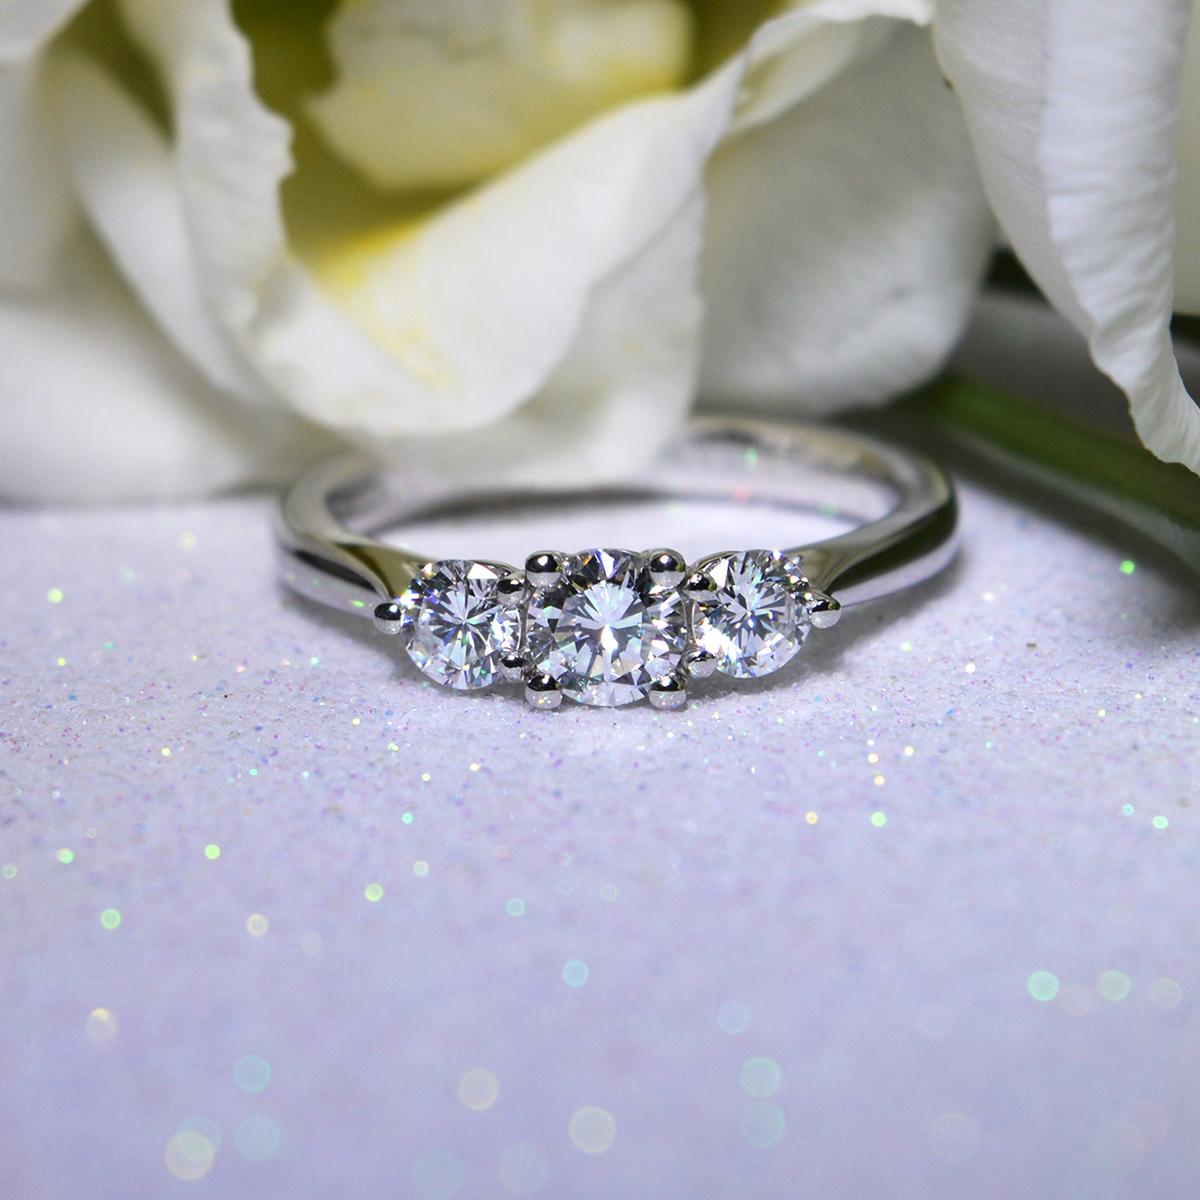 Brilliant Cut Diamond 3-Stone Engagement Ring